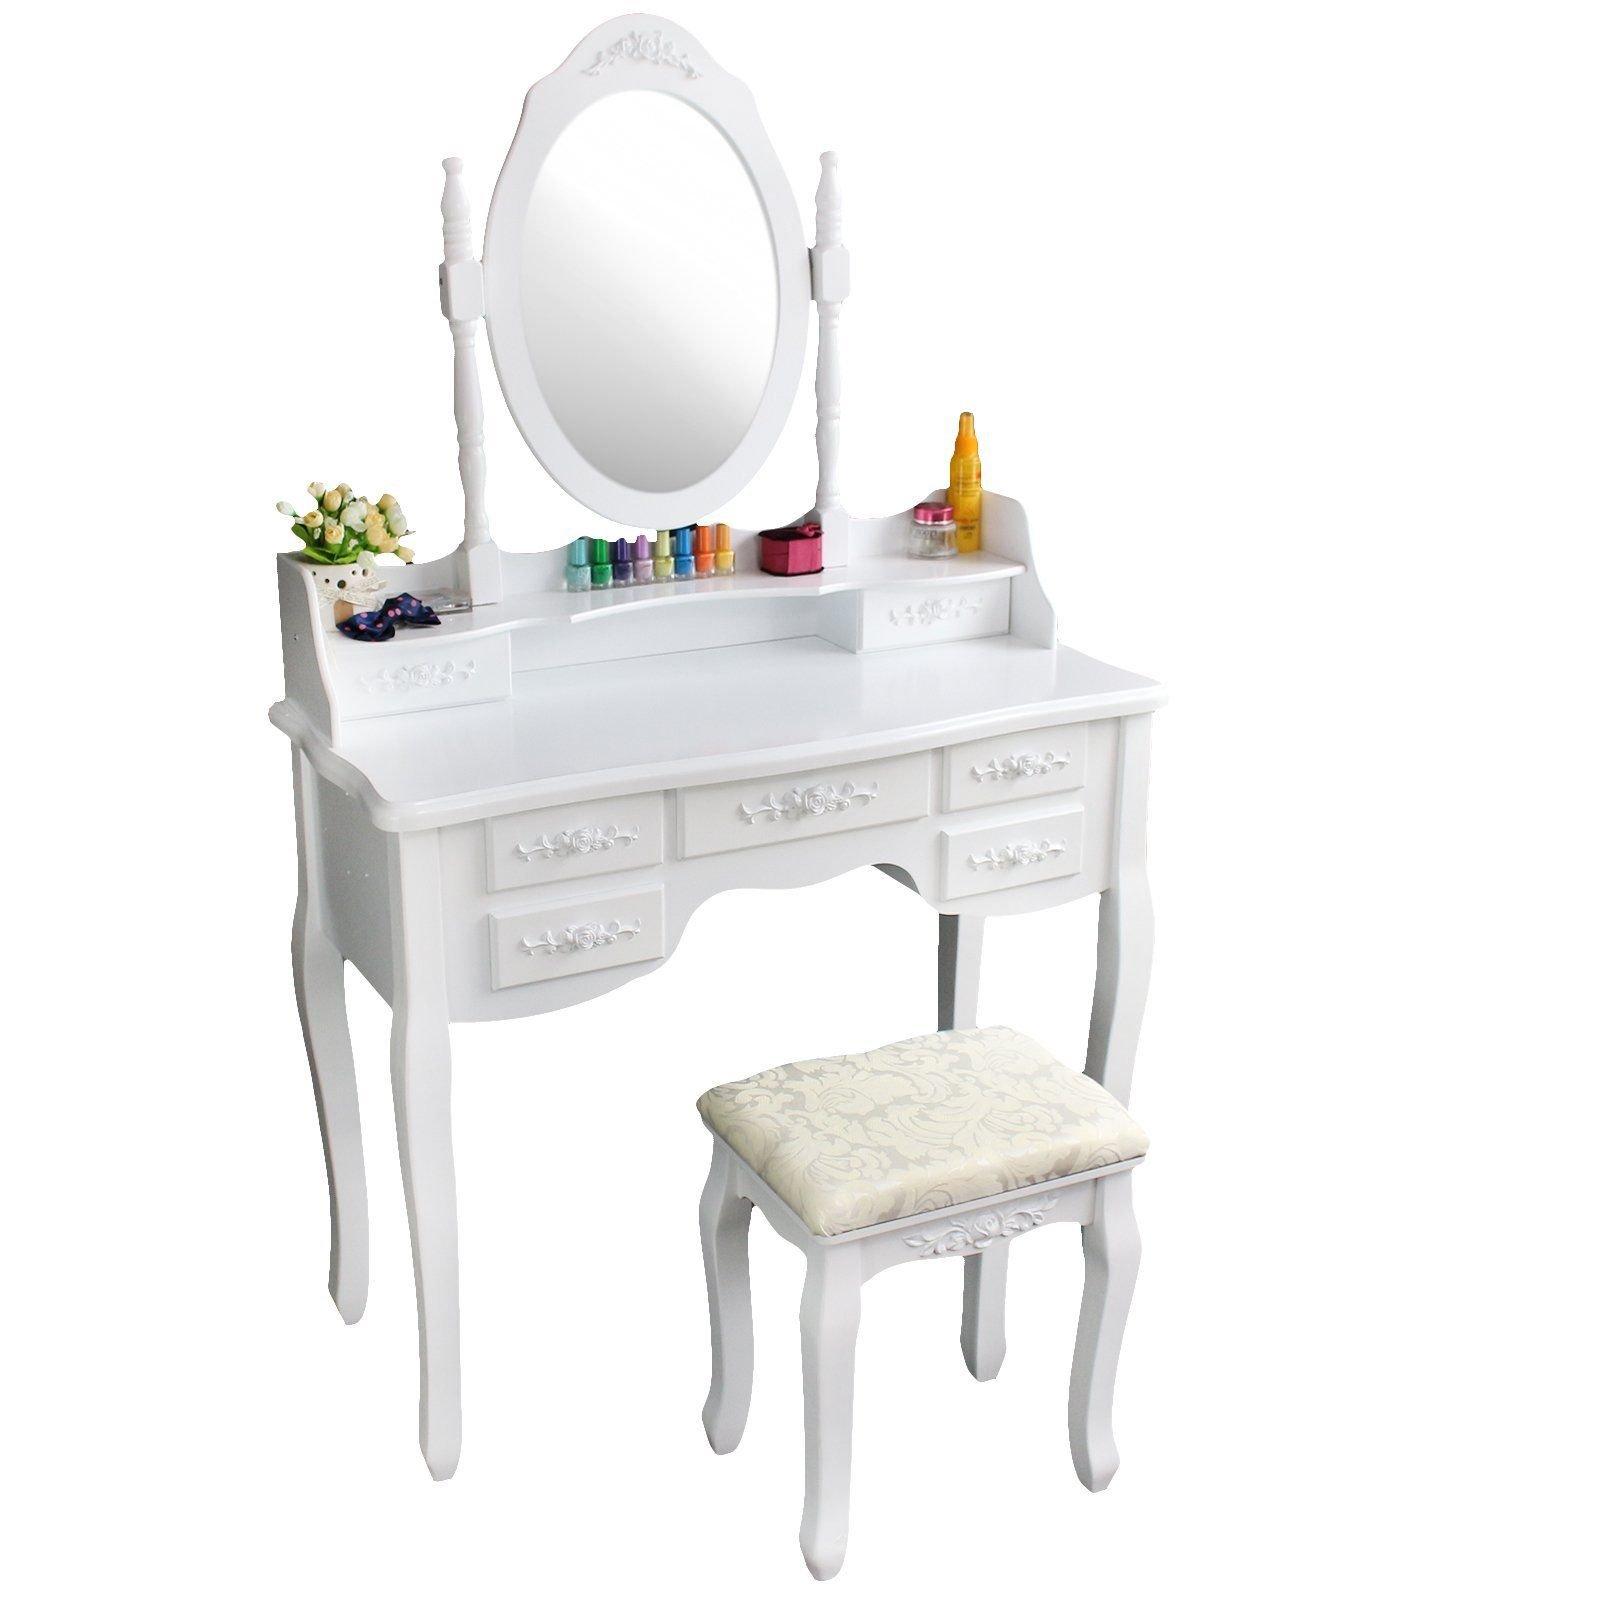 White Wood Makeup Vanity Table Set Mirror Stool Dressing Table Bedroom Furniture